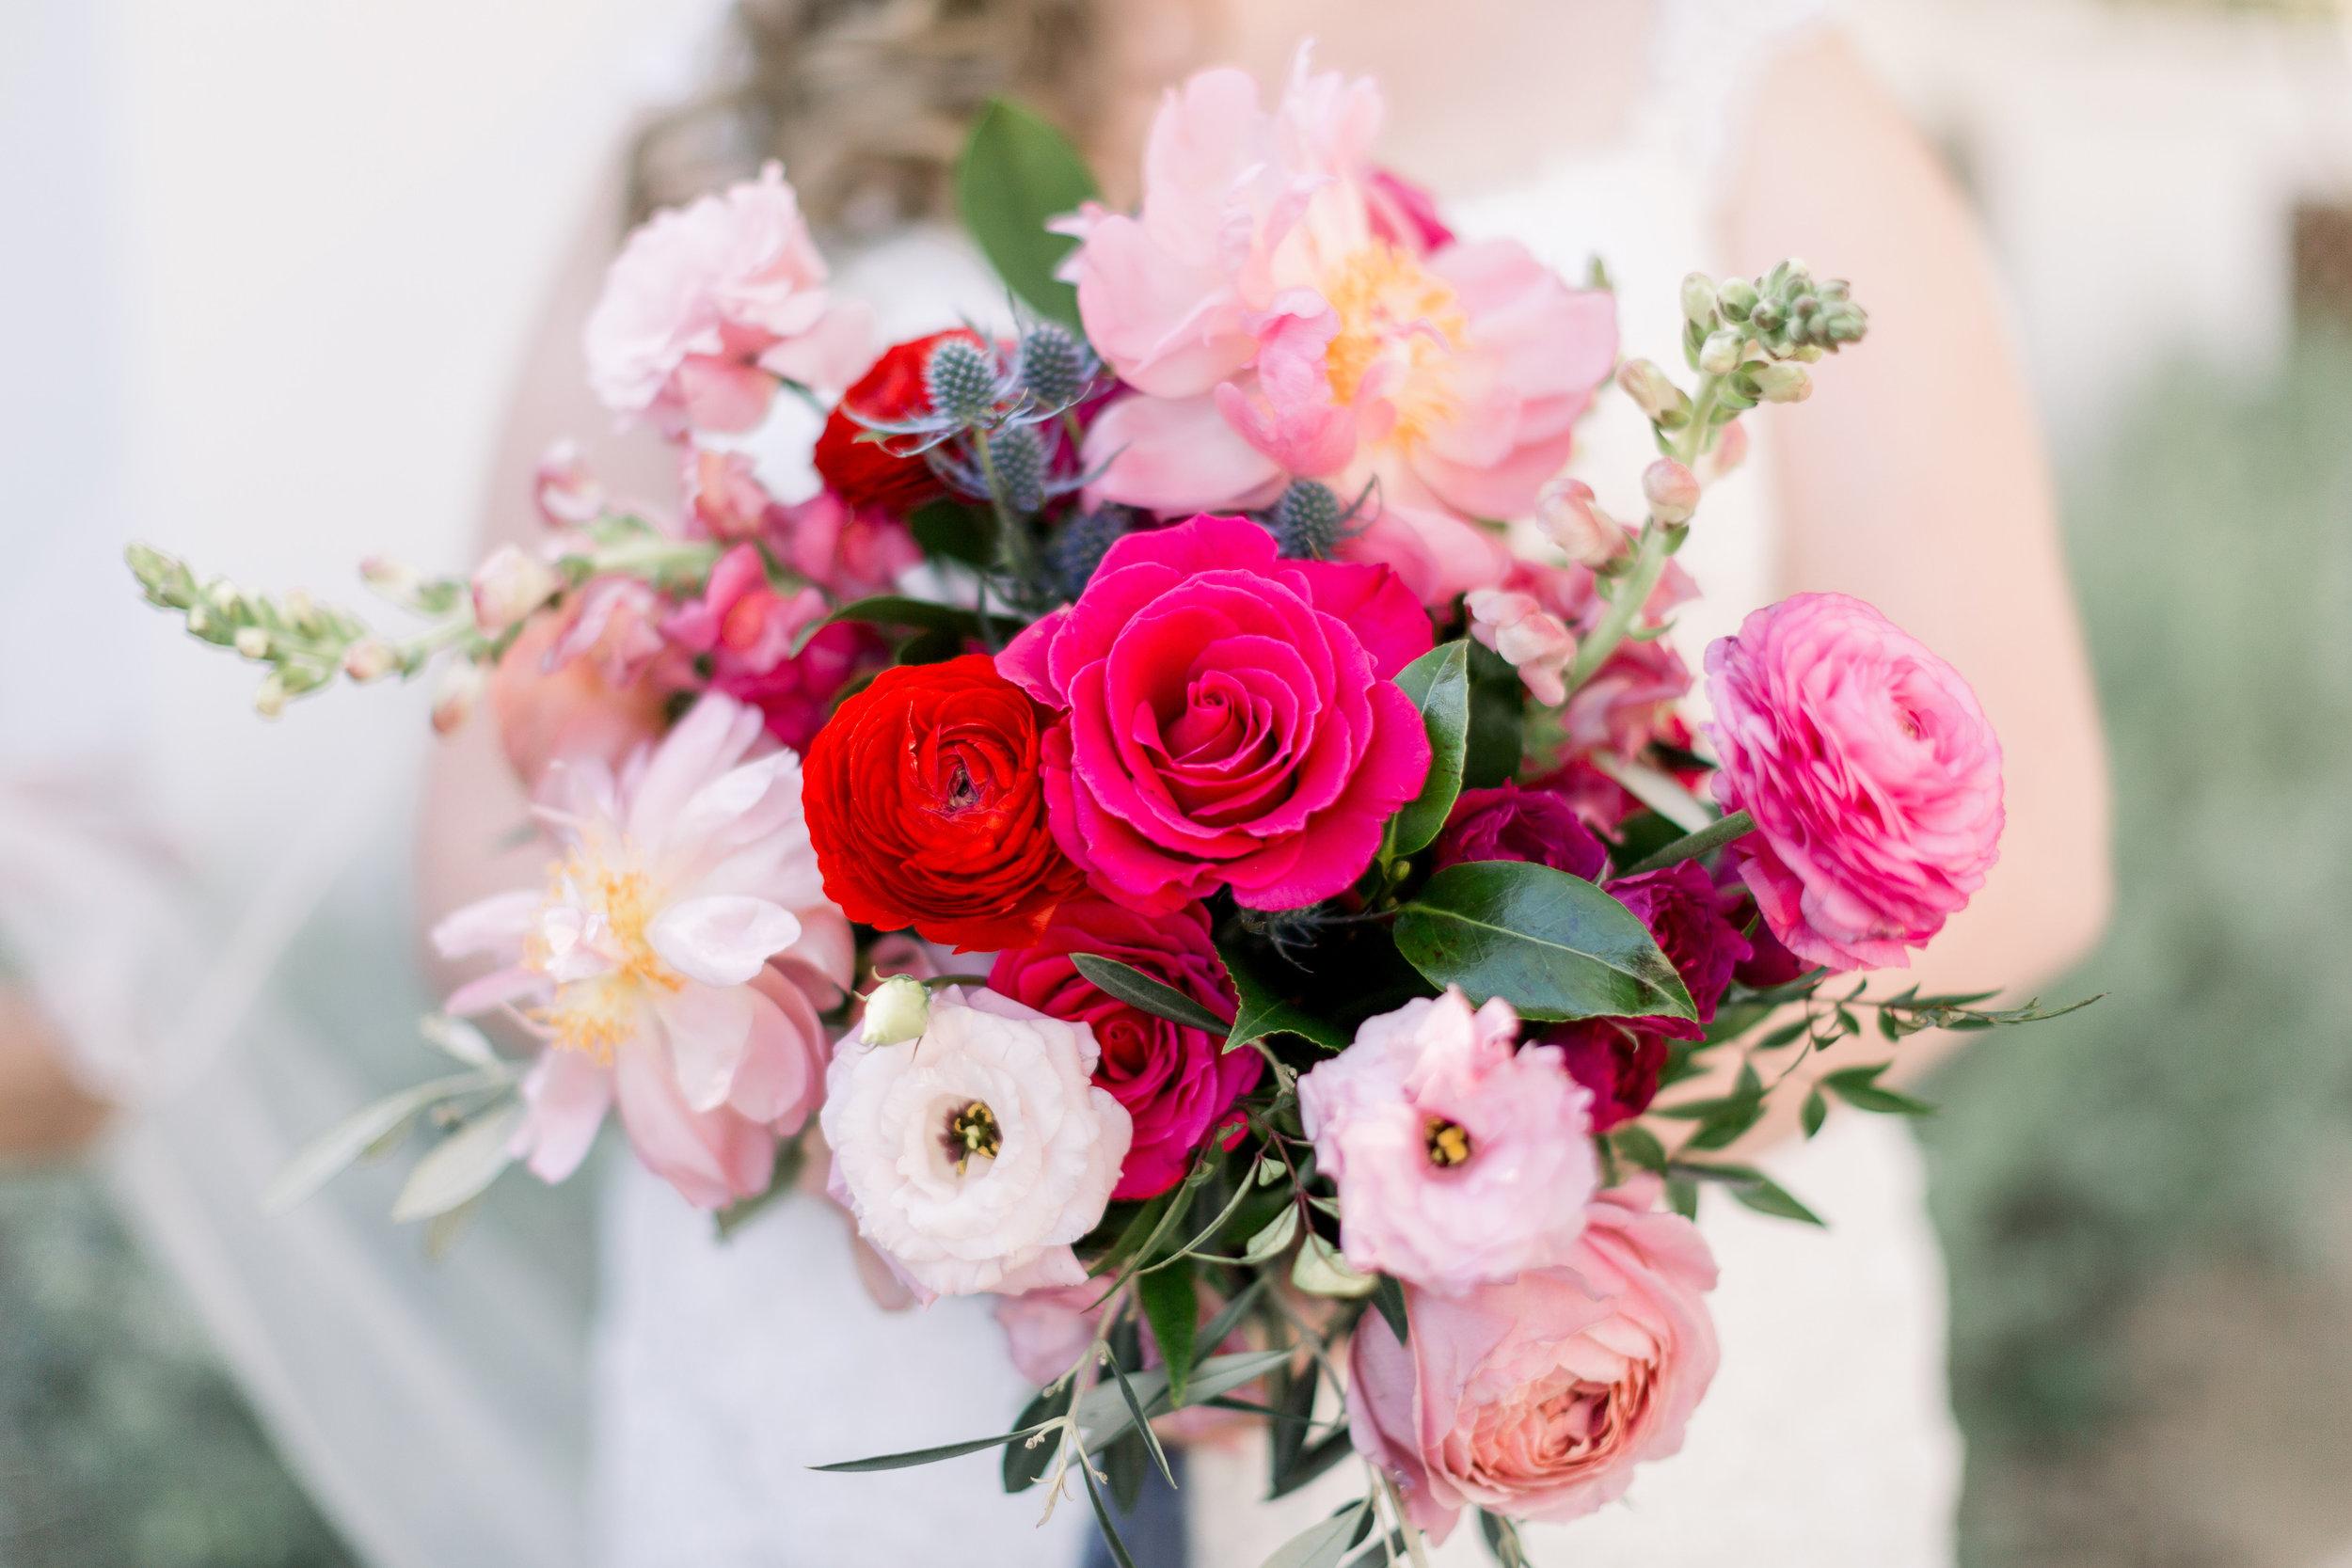 Roxanne and Brandon's El Chorro Wedding - Arizona florist Phoenix scottsdale Mesa chandler Sedona Prescott - Hot pink and red bridal bouquet with garden roses, peonies, roses, and snapdragon